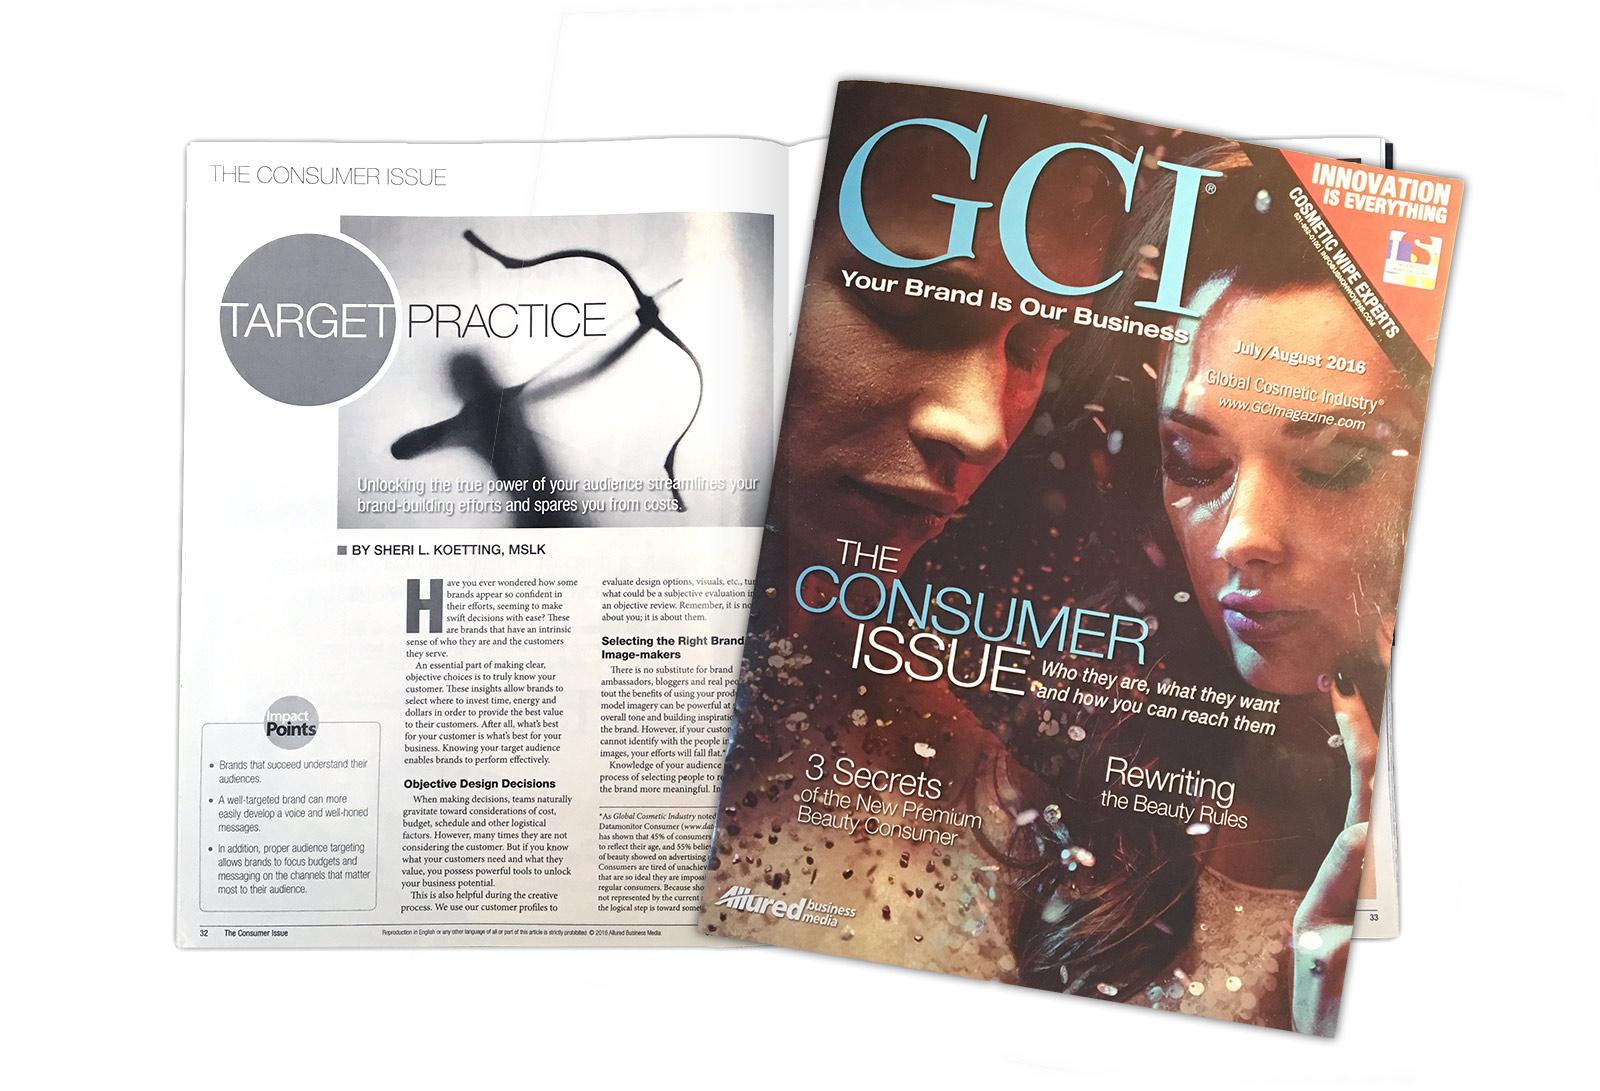 GCI Article: Target Practice